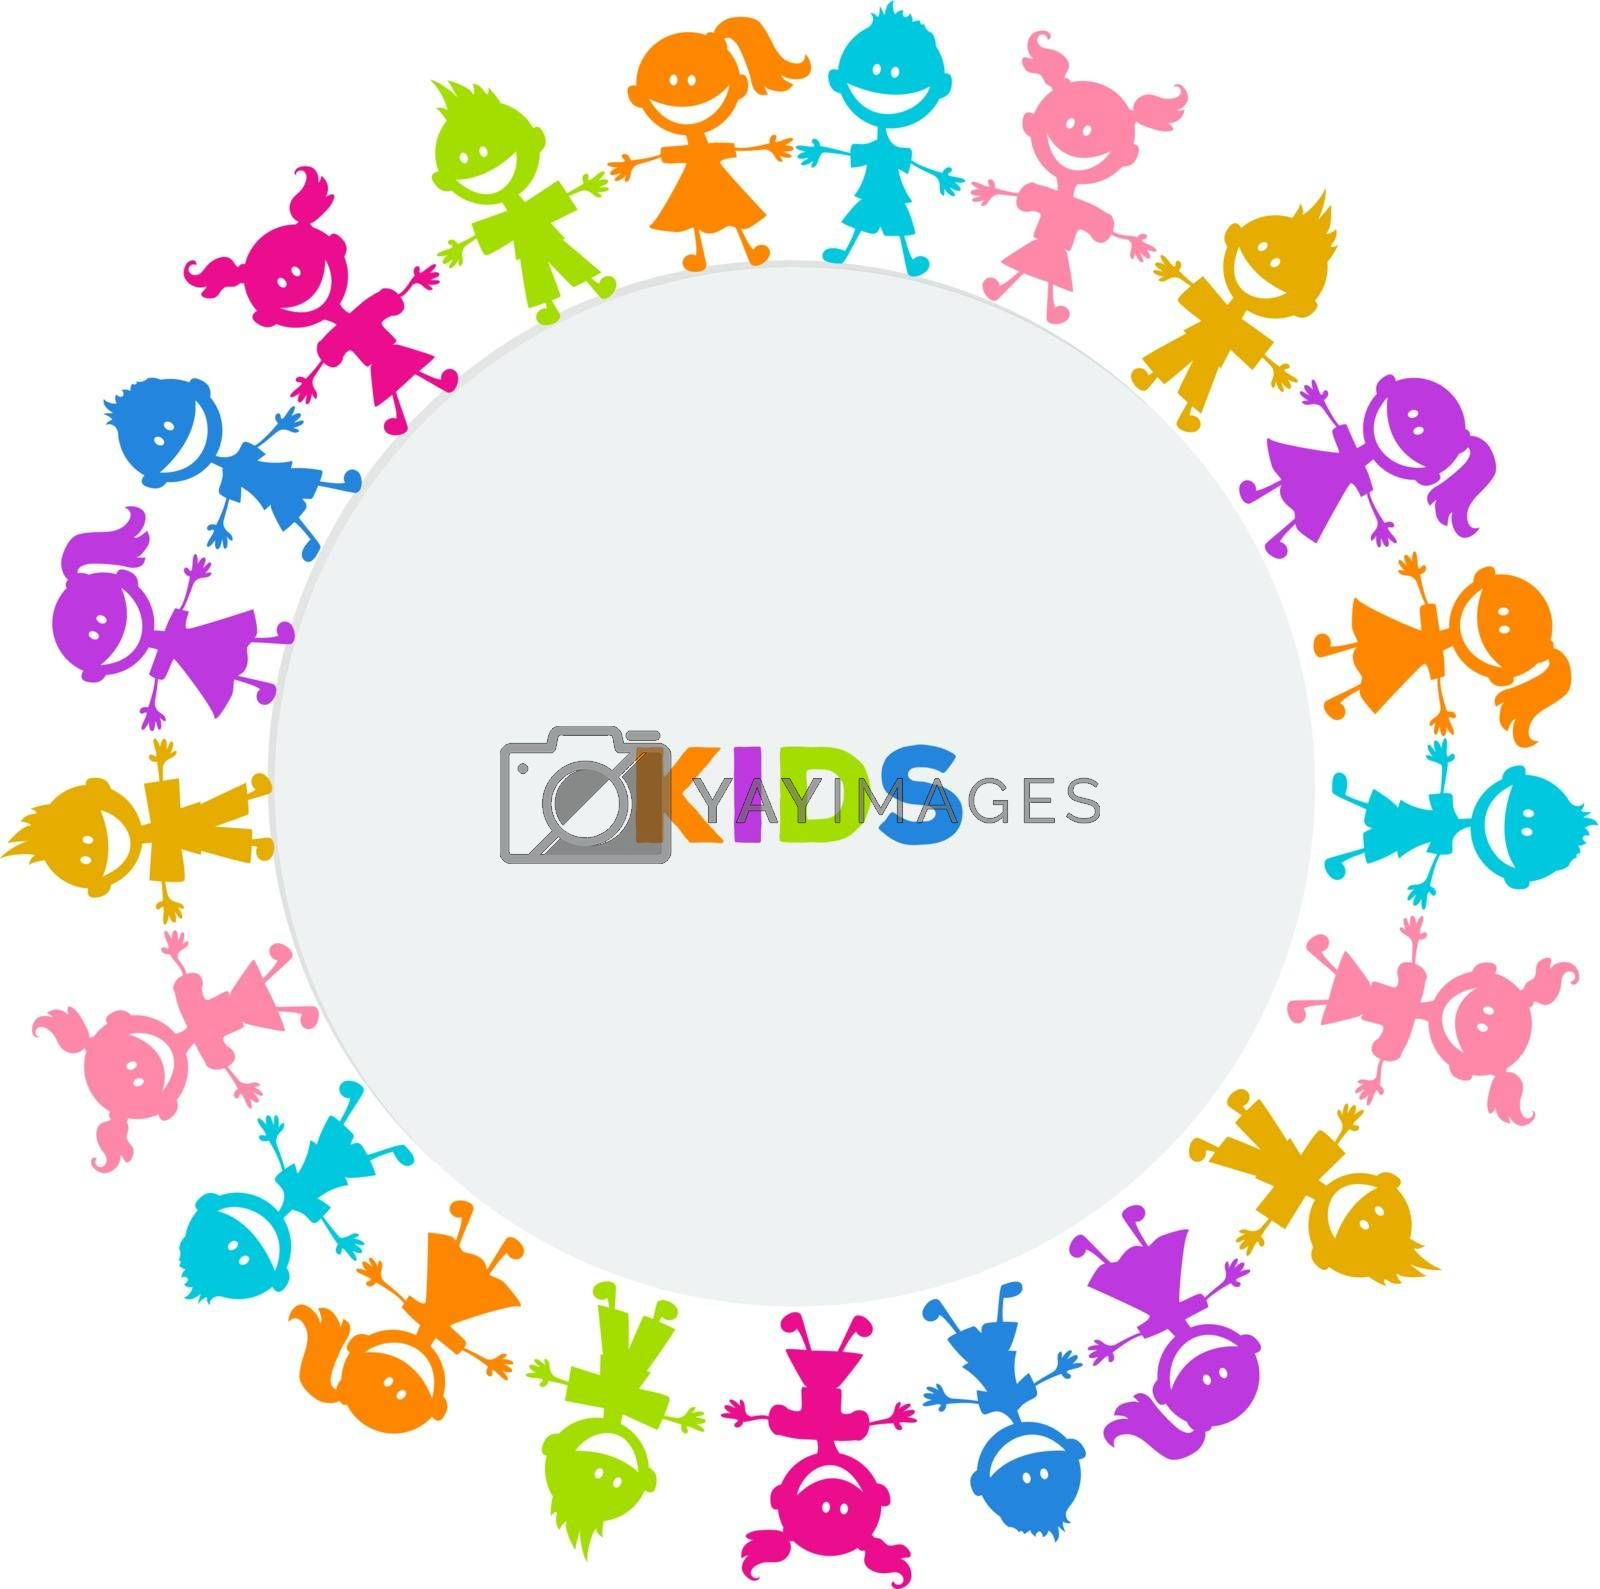 Vector illustration of Colorful kids friends image